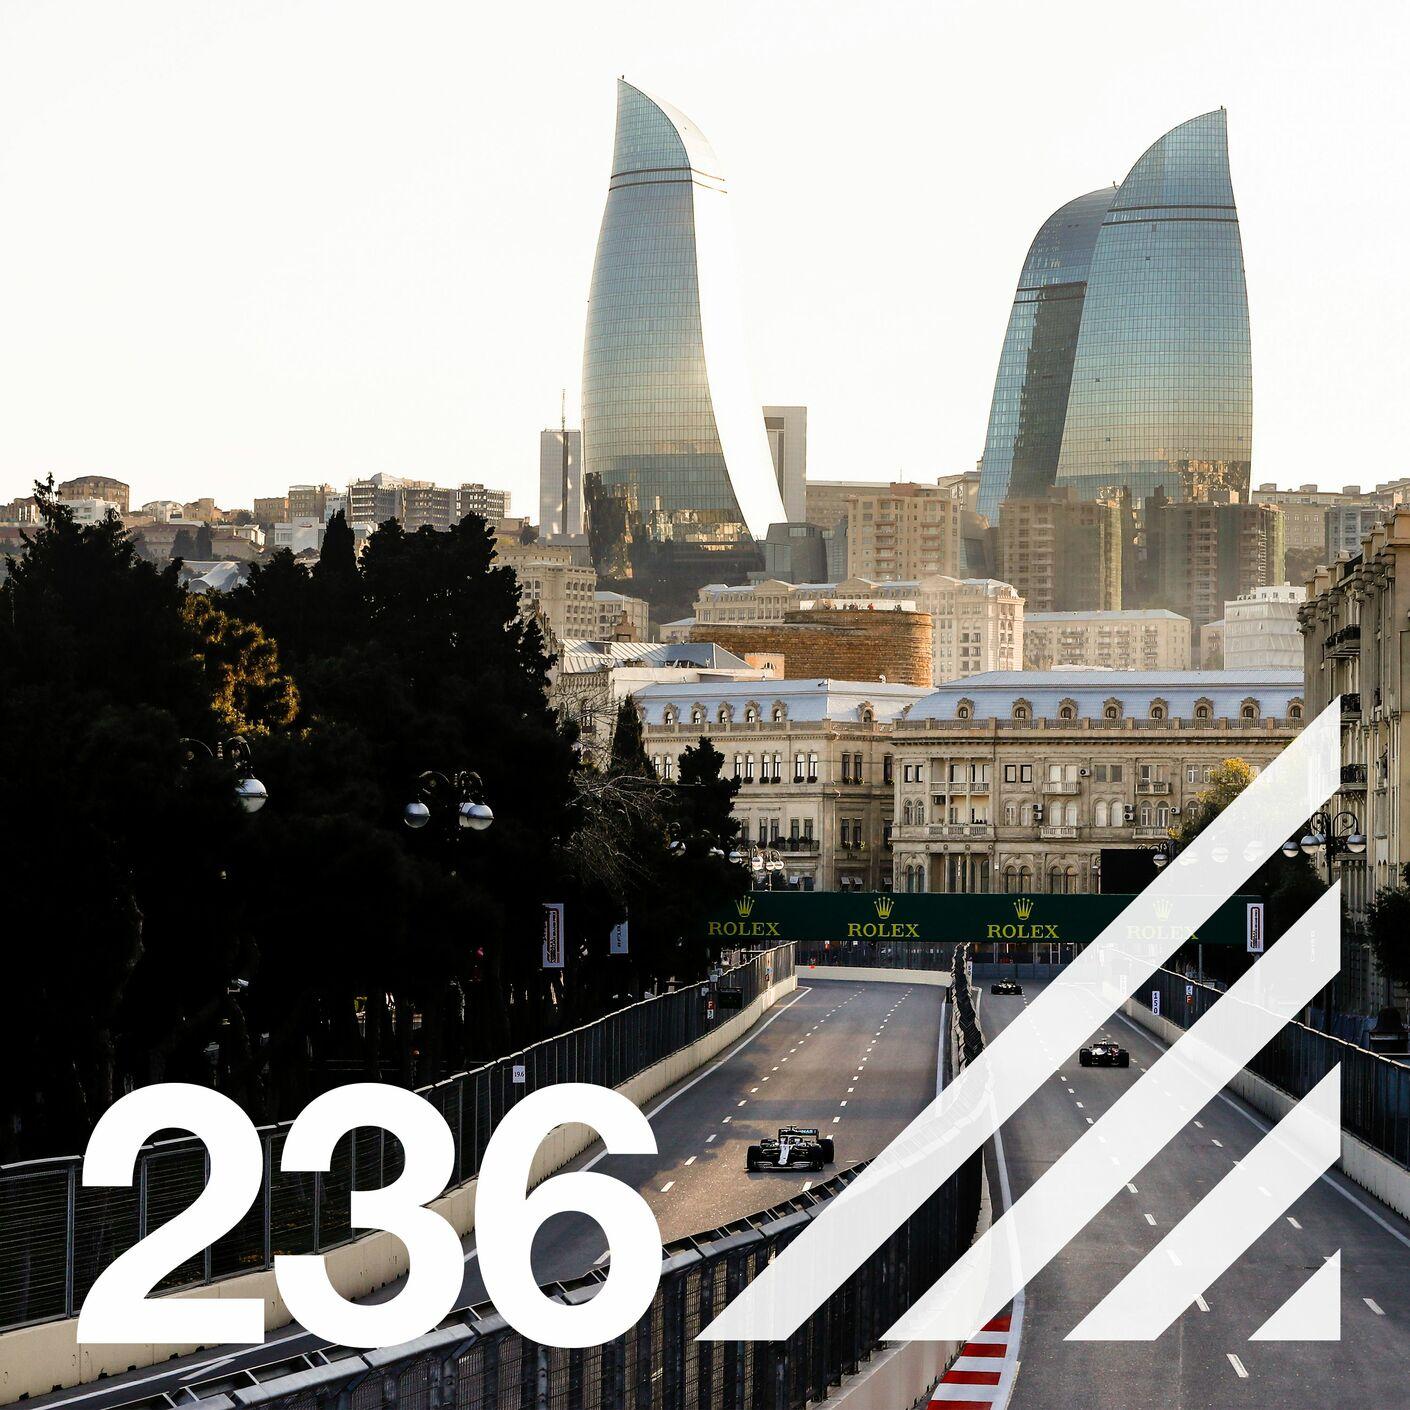 236. Another one bites the dust + Intervju med Dino Beganovic